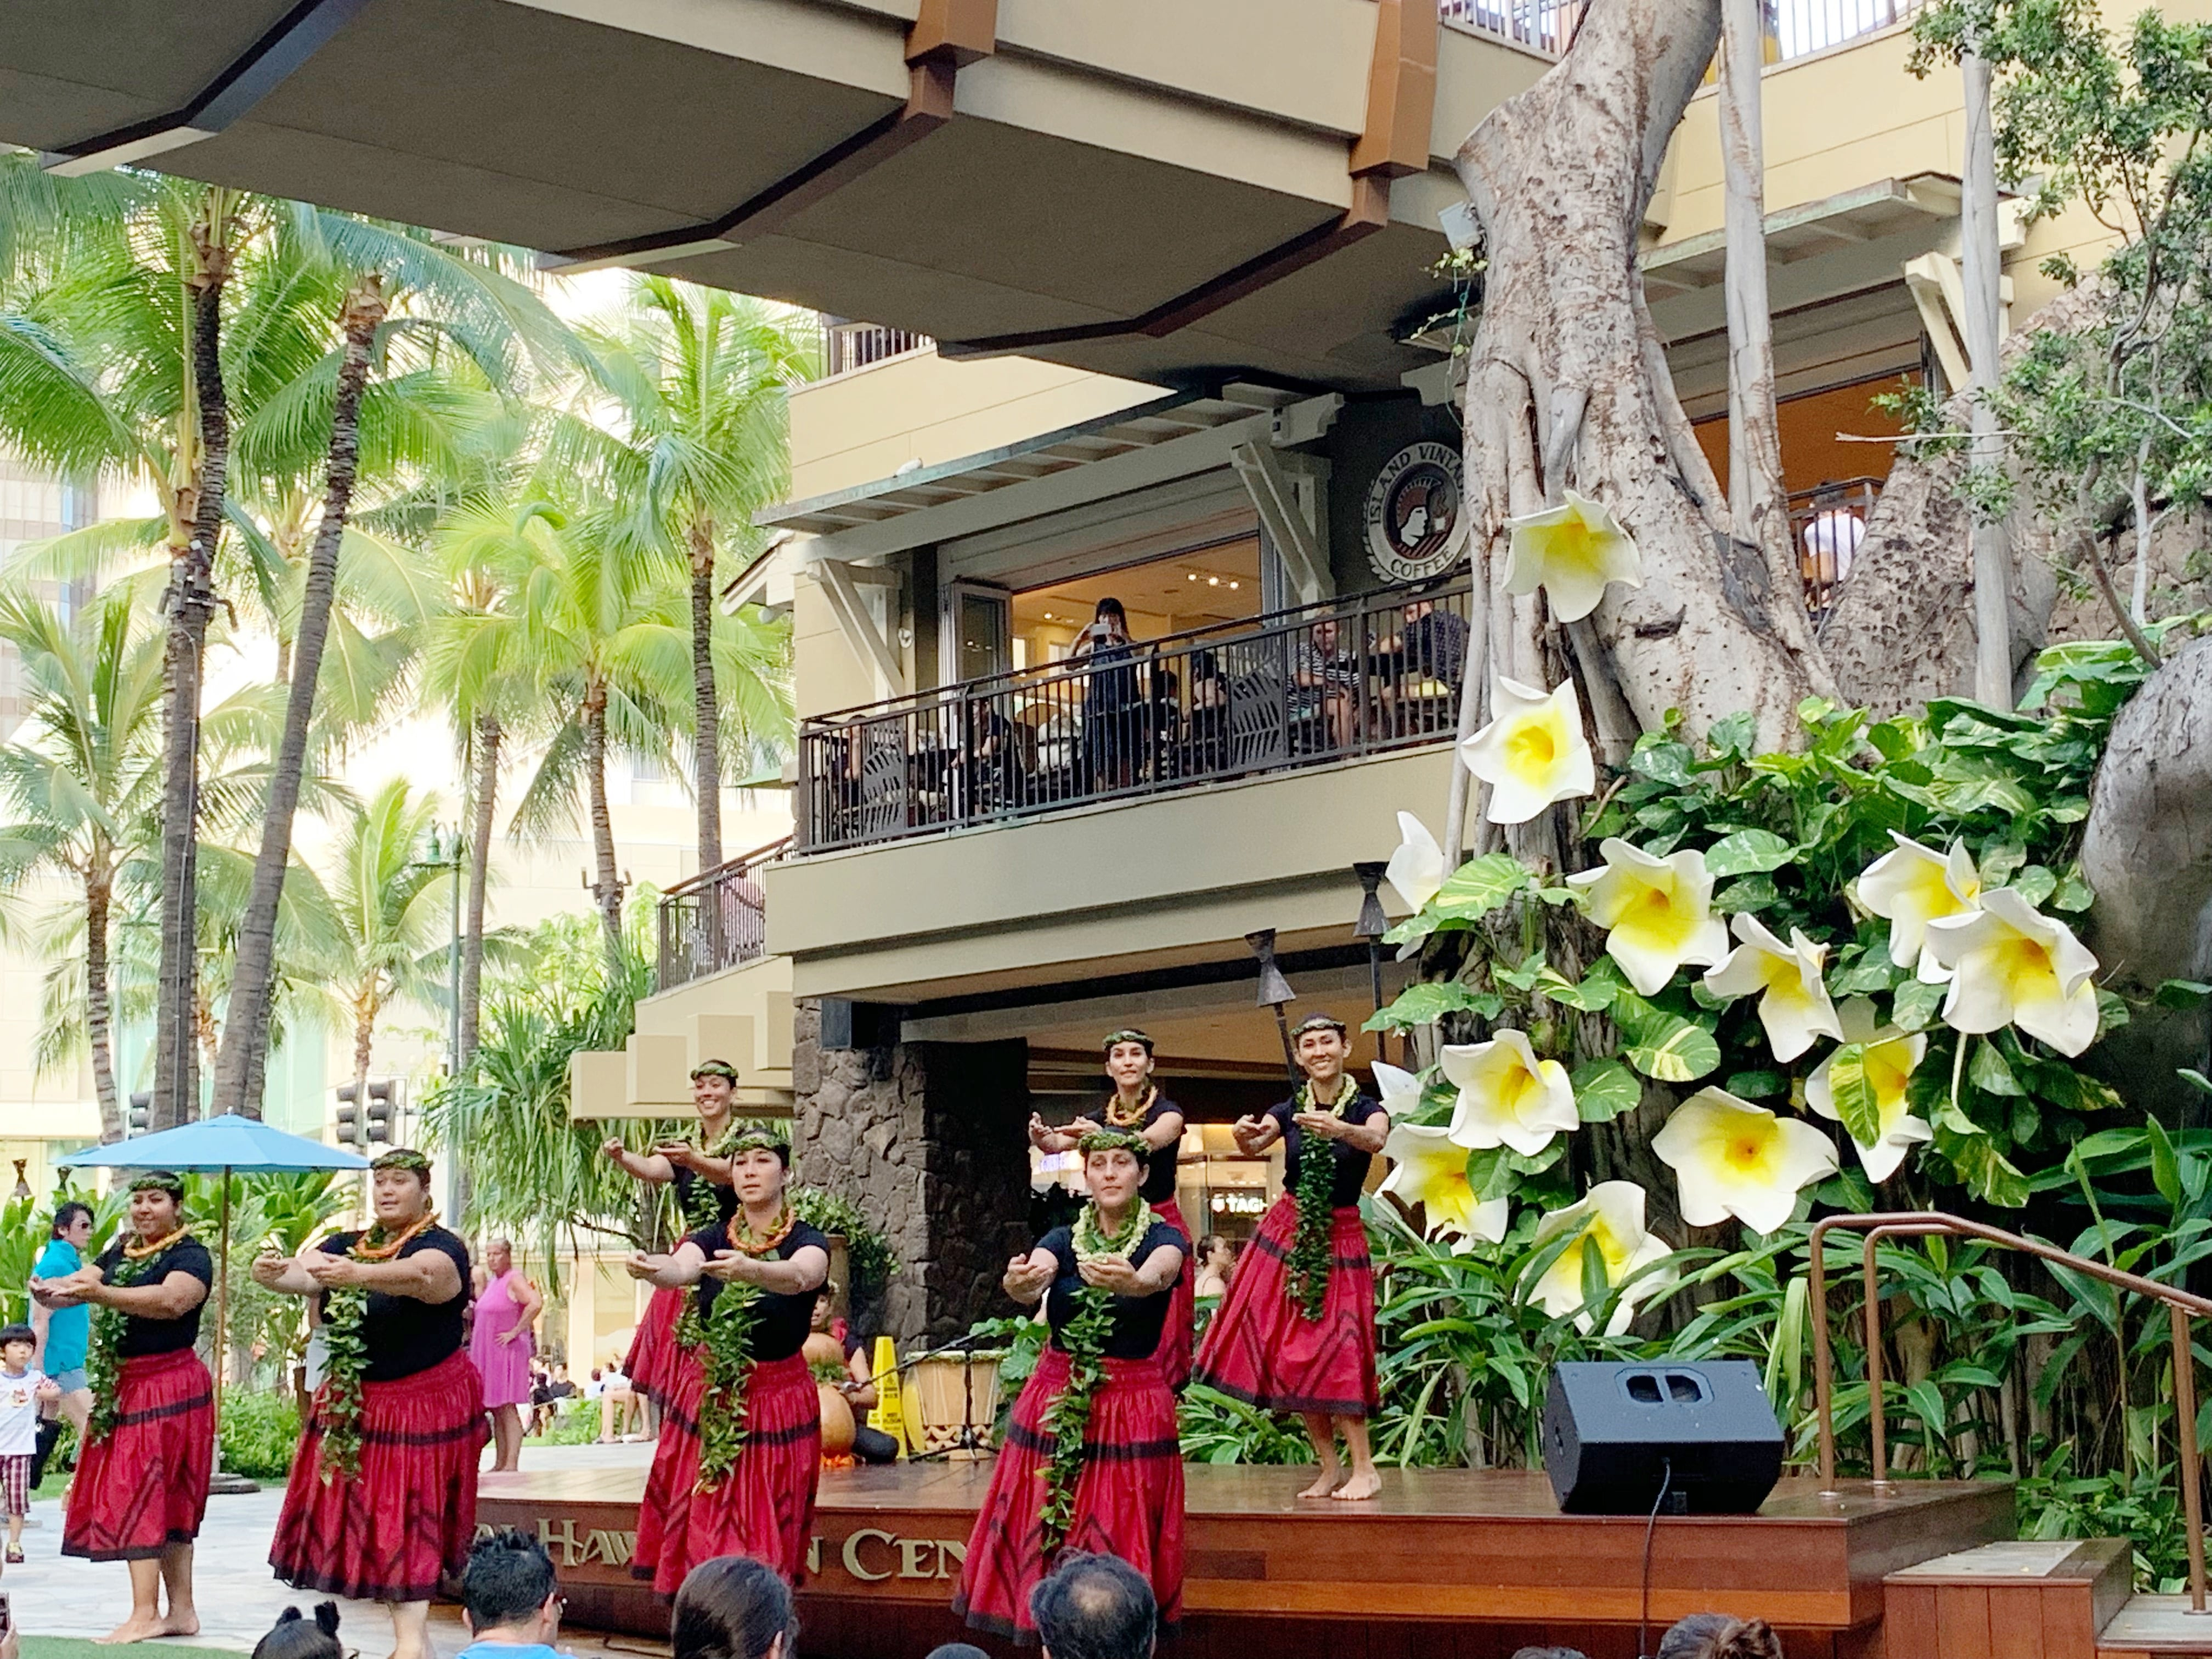 Free Hula Performance At Royal Hawaiian Center - Enjoy a complimentary hula performance on Saturday nights at Royal Hawaiian Center in Honolulu, Hawaii! | Royal Hawaiian Center - Free Activities in Hawaii - Oahu Hawaii